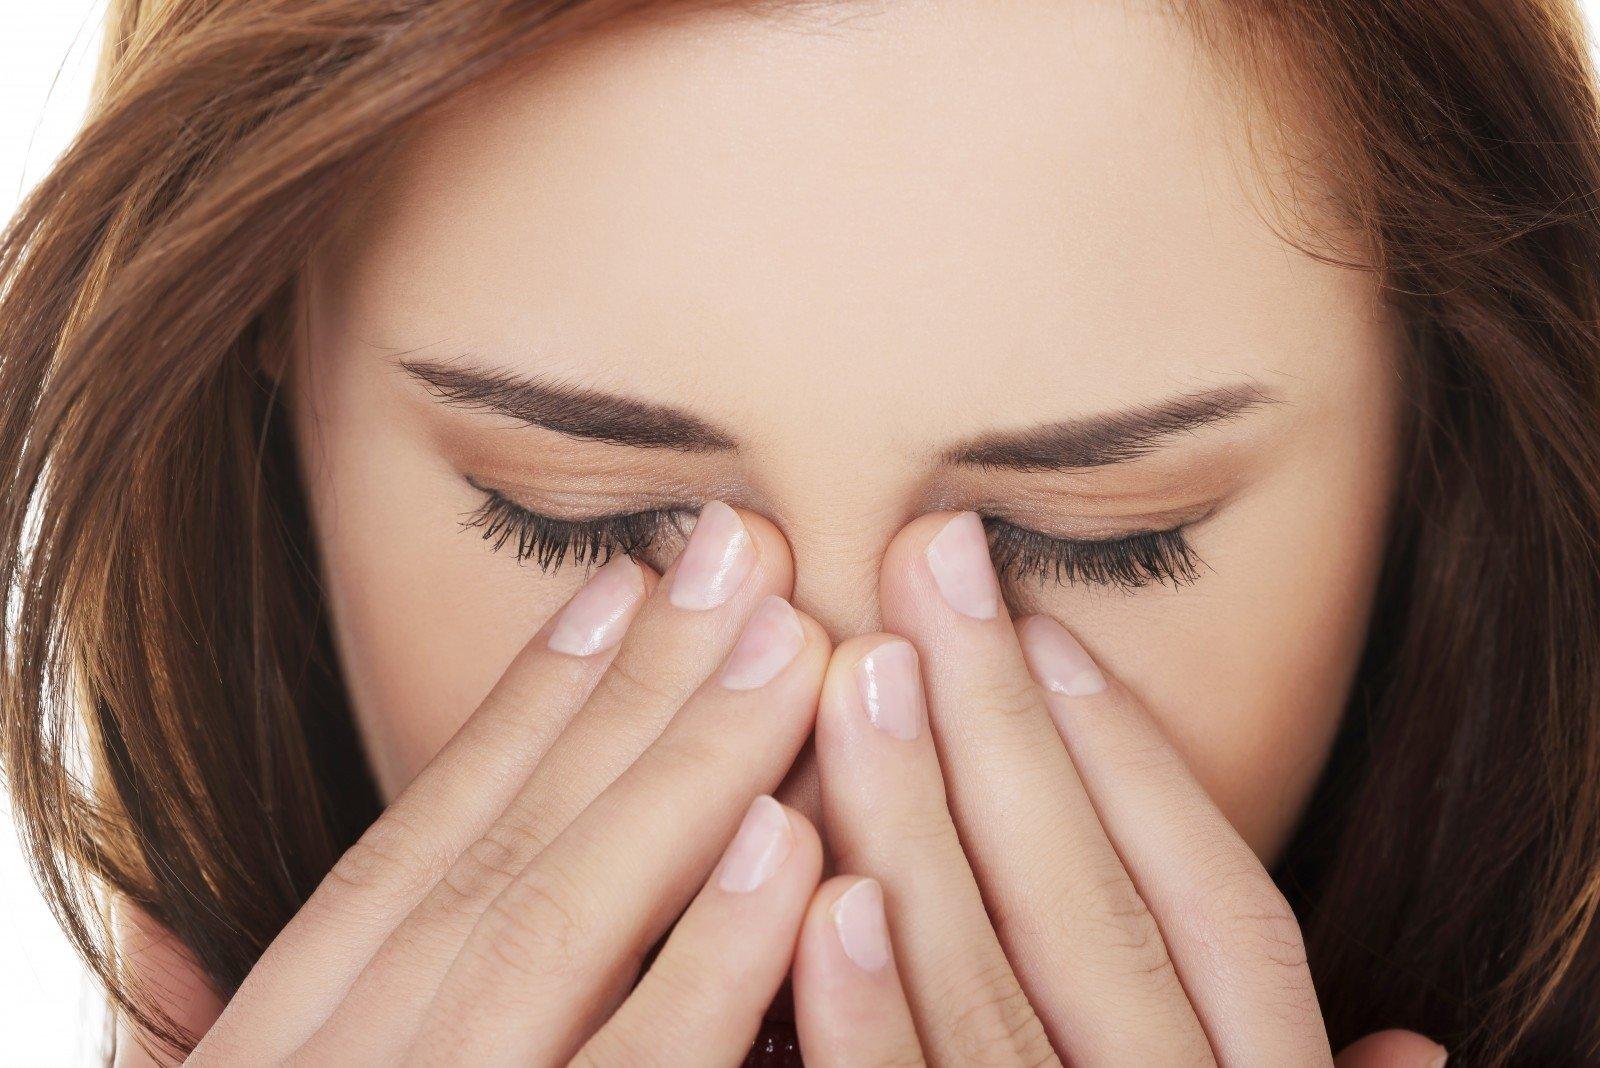 sergant hipertenzija, skauda akis hipertenzija dvasinė liga